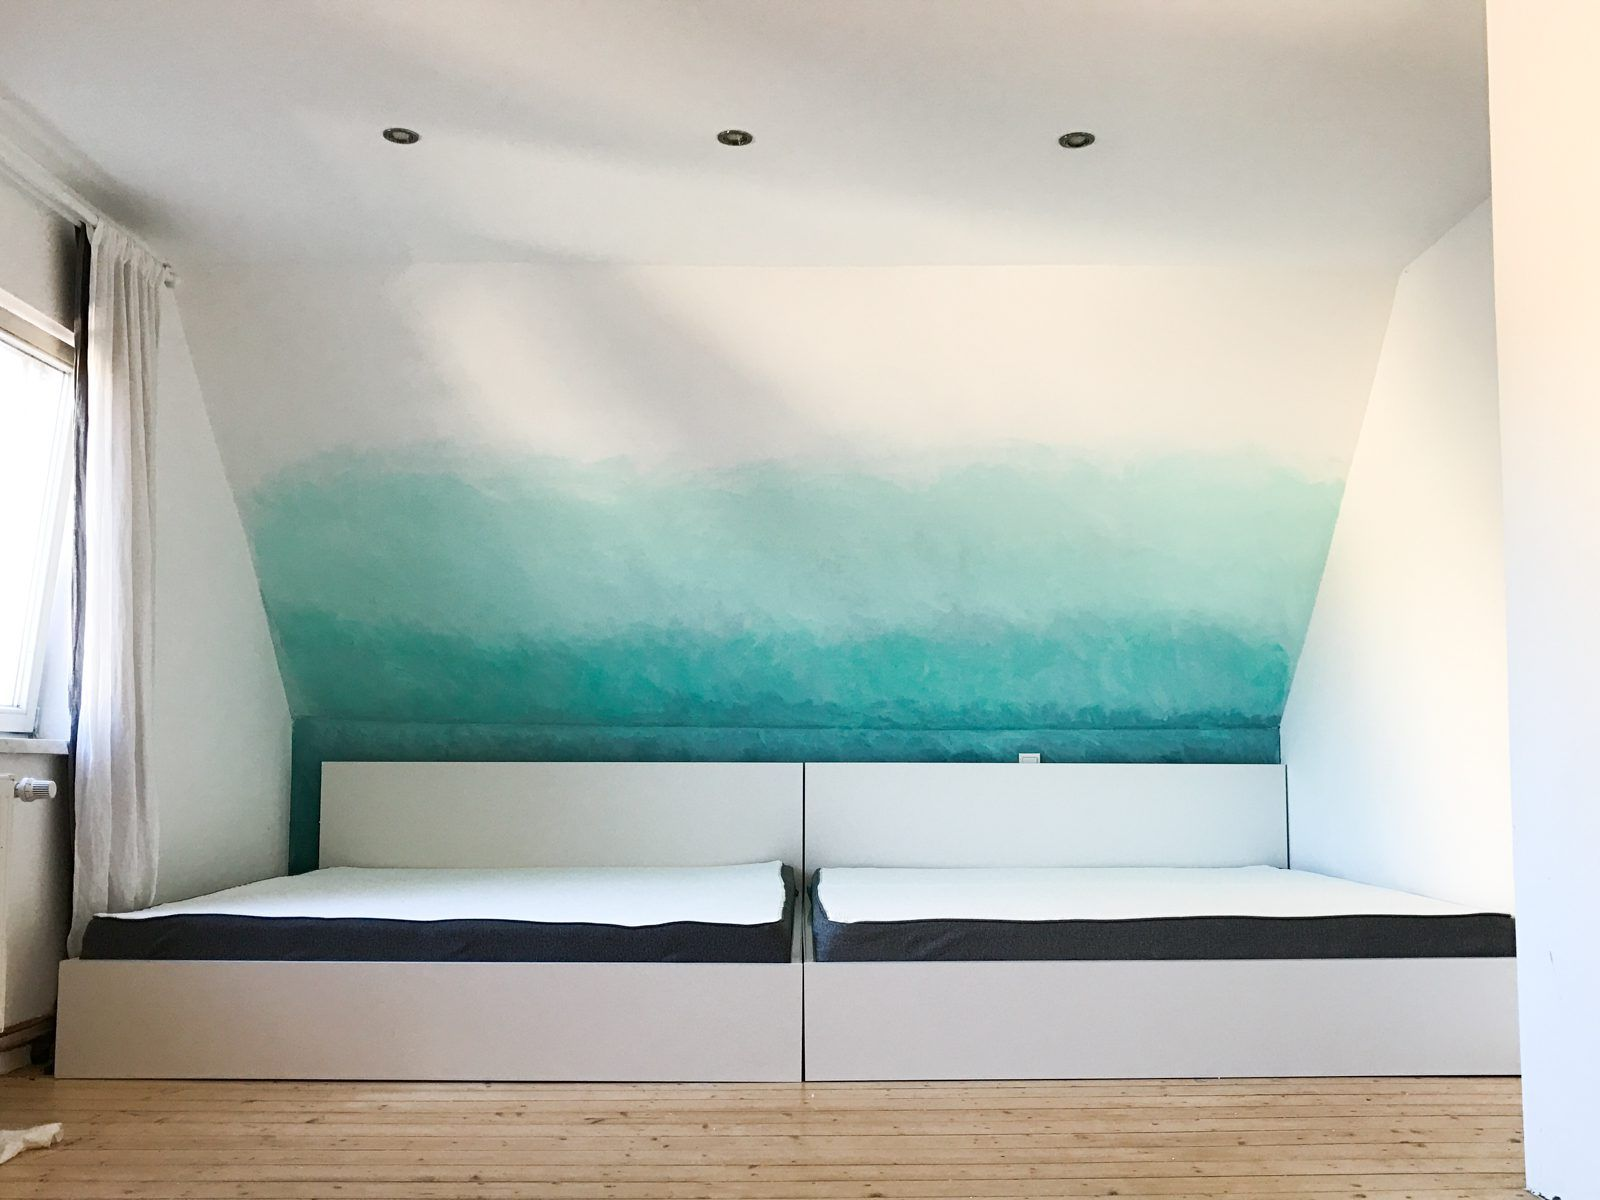 Projekt groes Familienbett XXL  Wohnen  Haus  Living